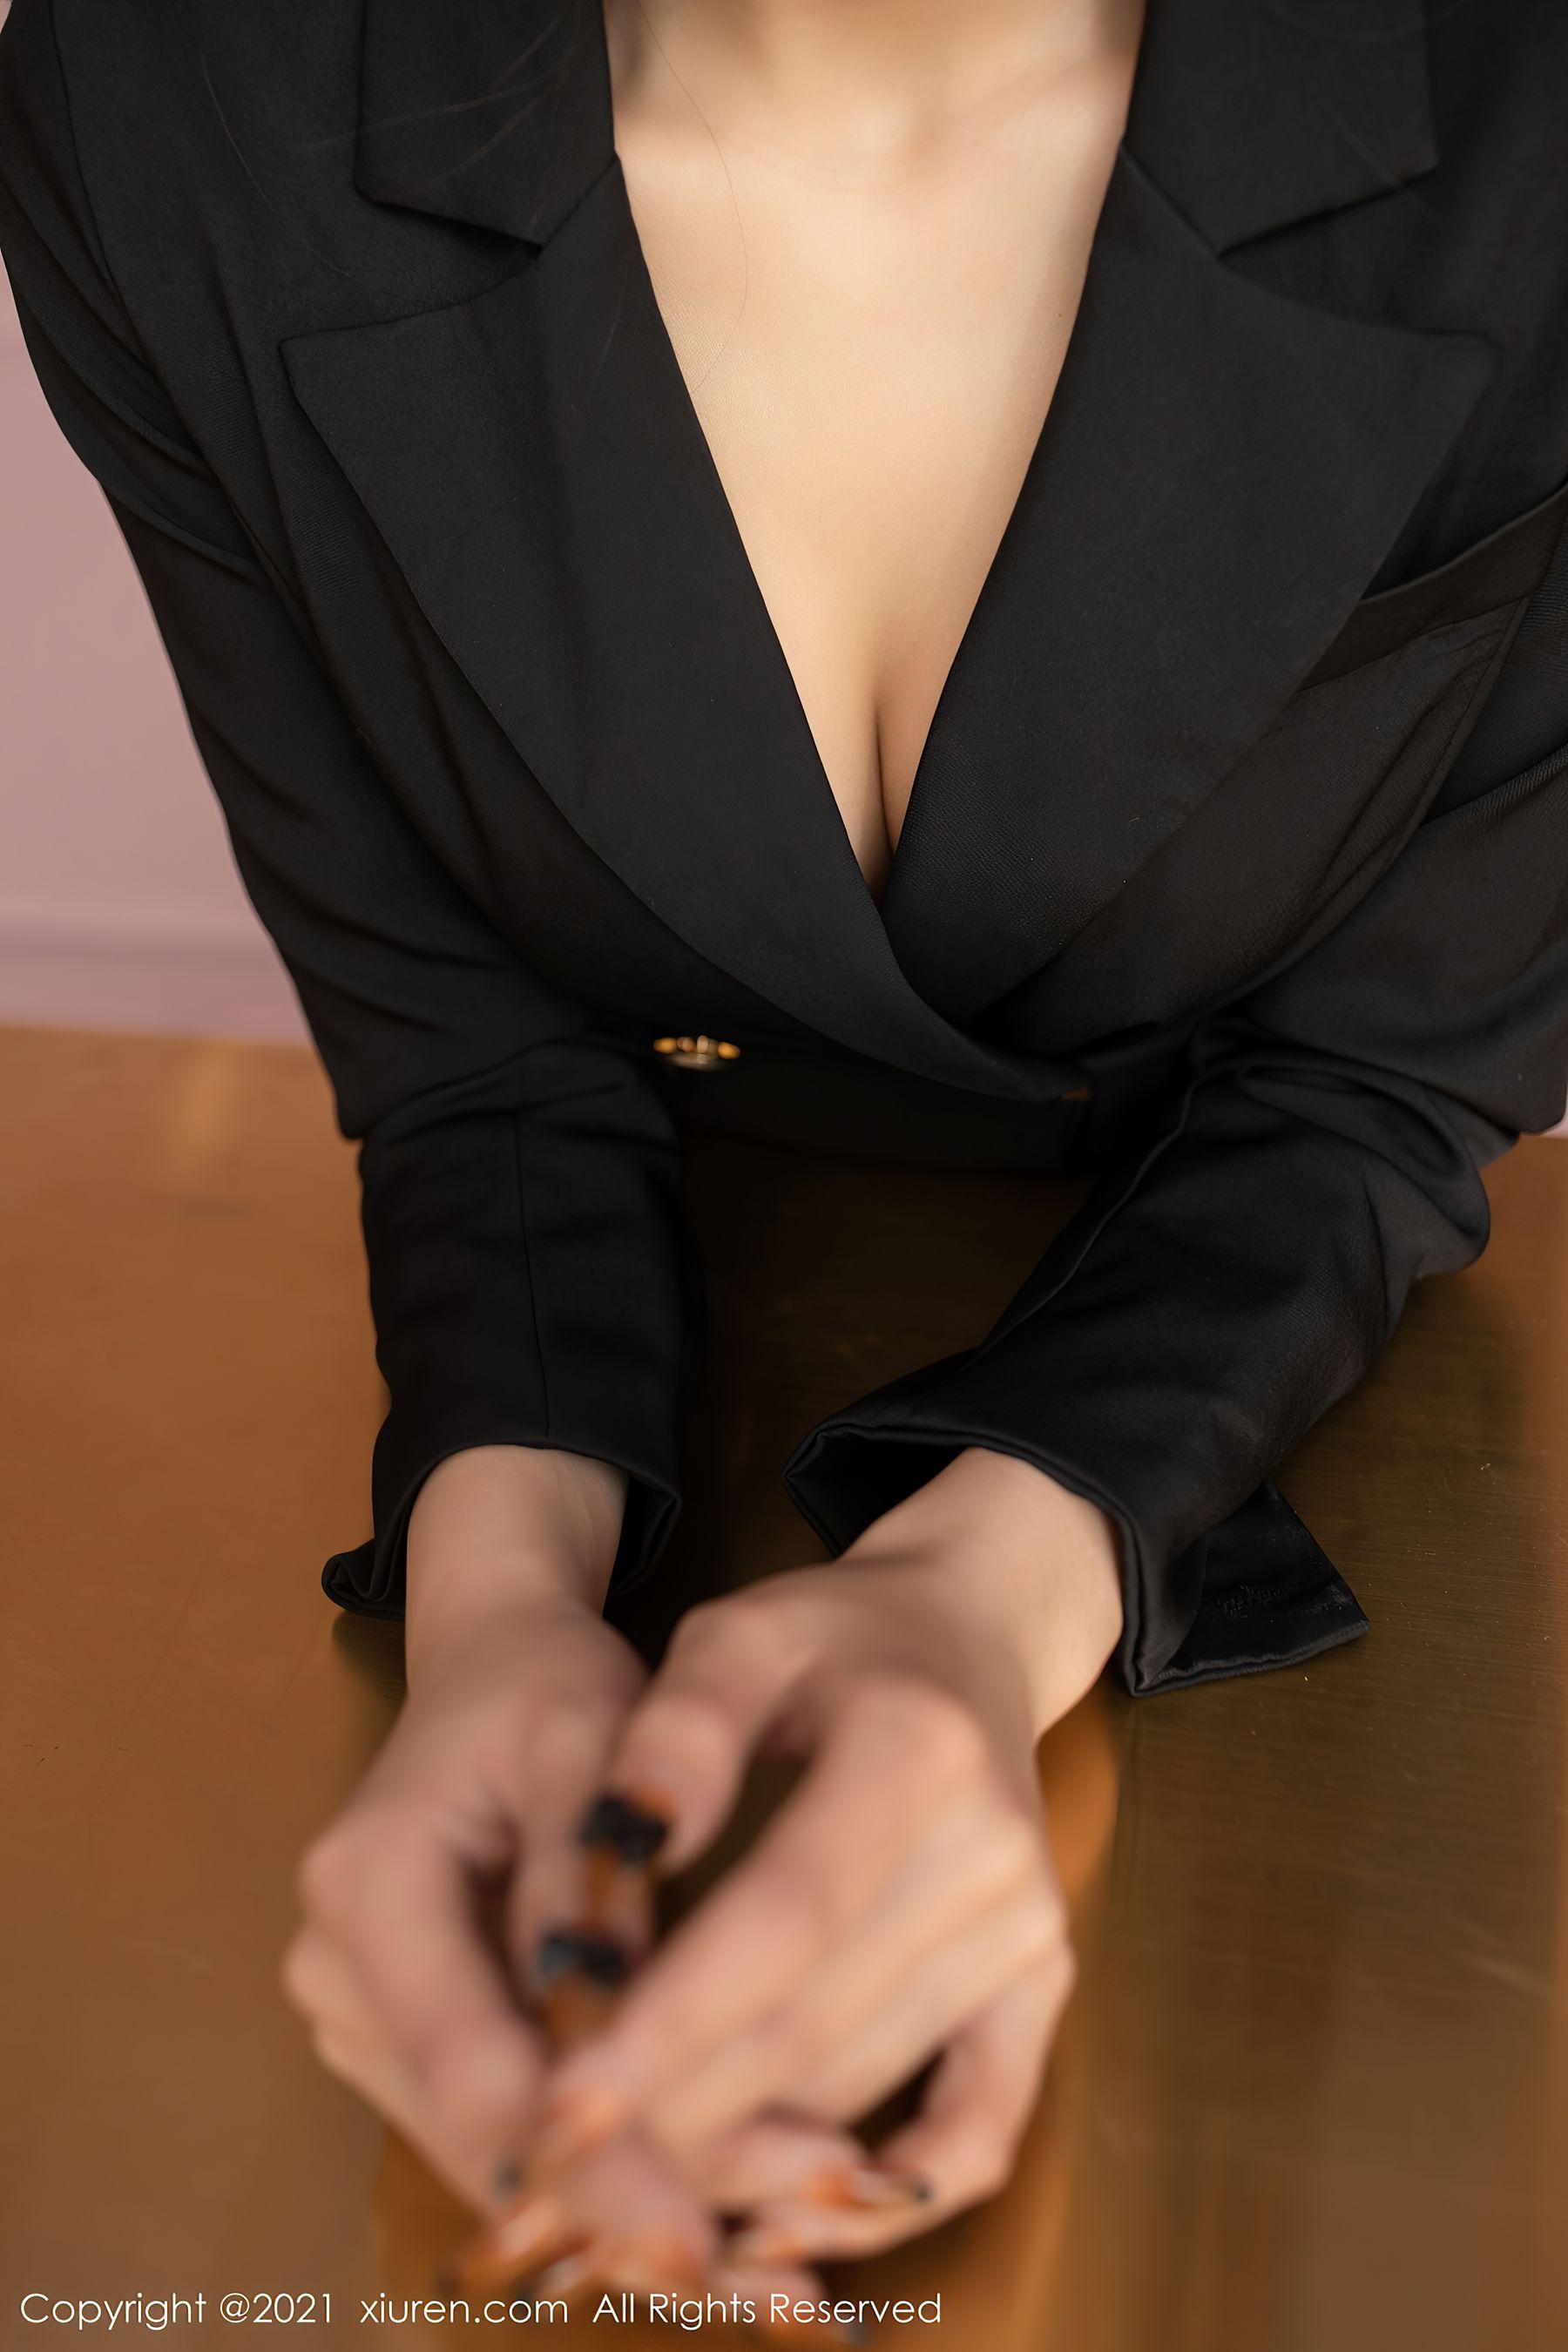 VOL.1073 [秀人网]职业装黑丝诱惑:陈小喵(陈小喵Aurora,原天夕子)超高清写真套图(66P)